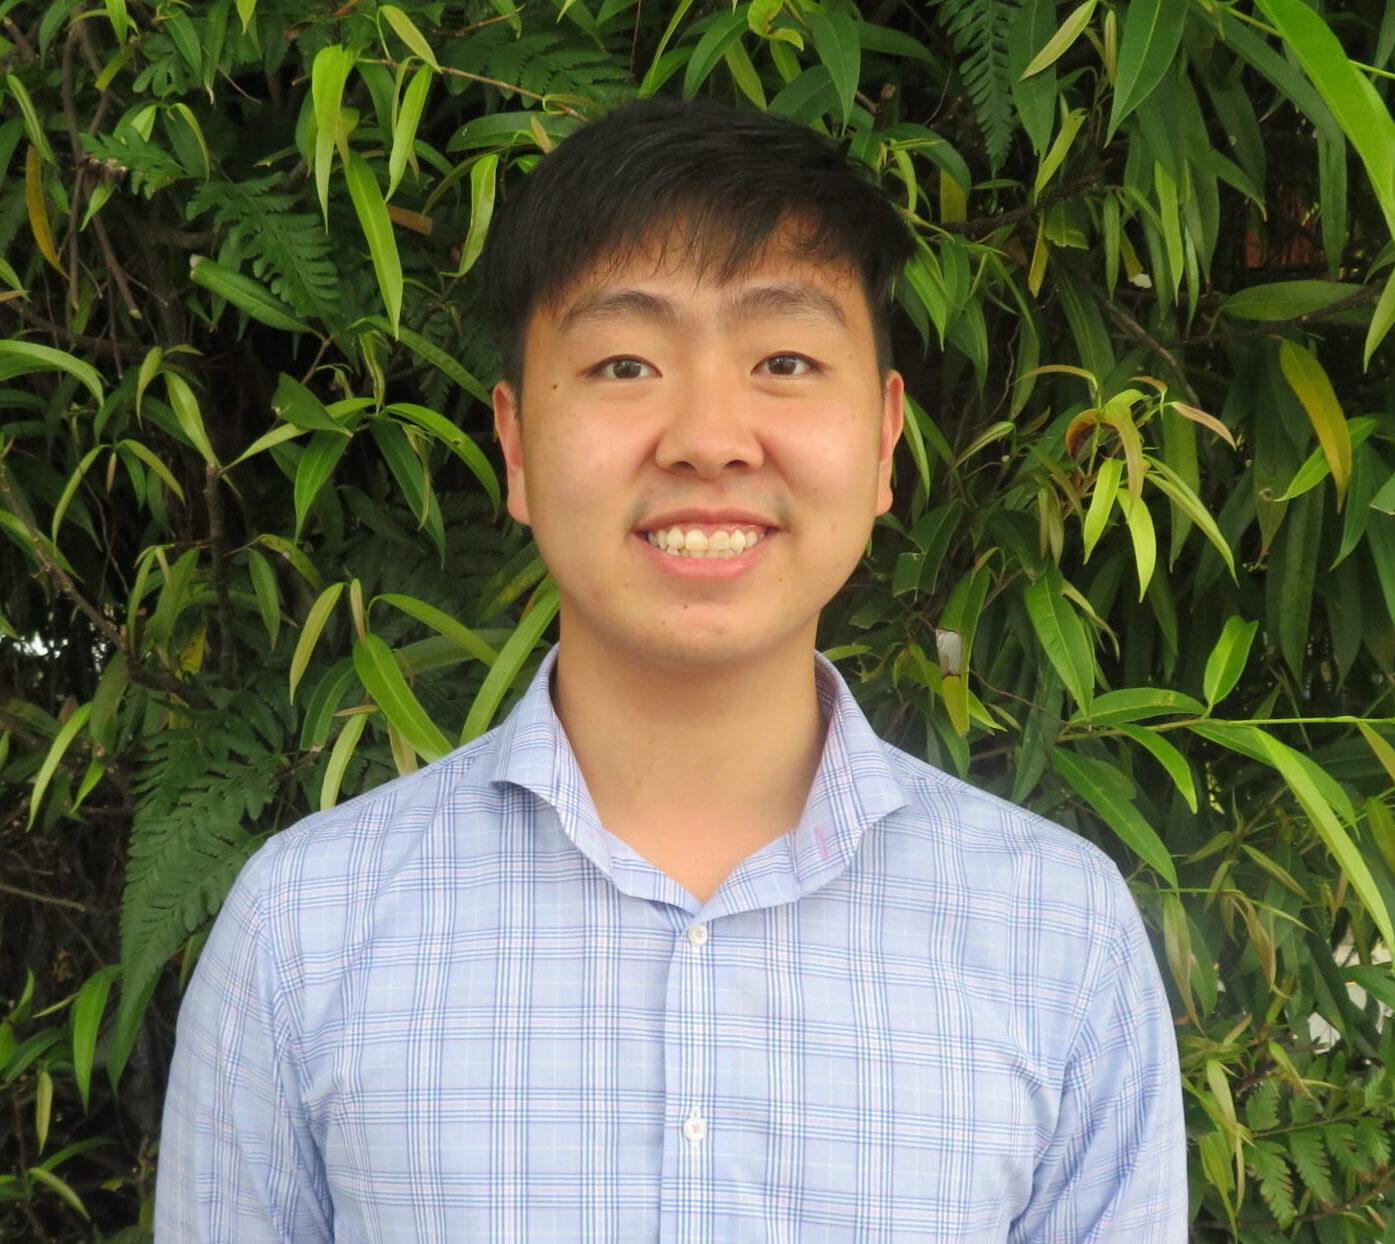 Atlas Lim Wen Jie